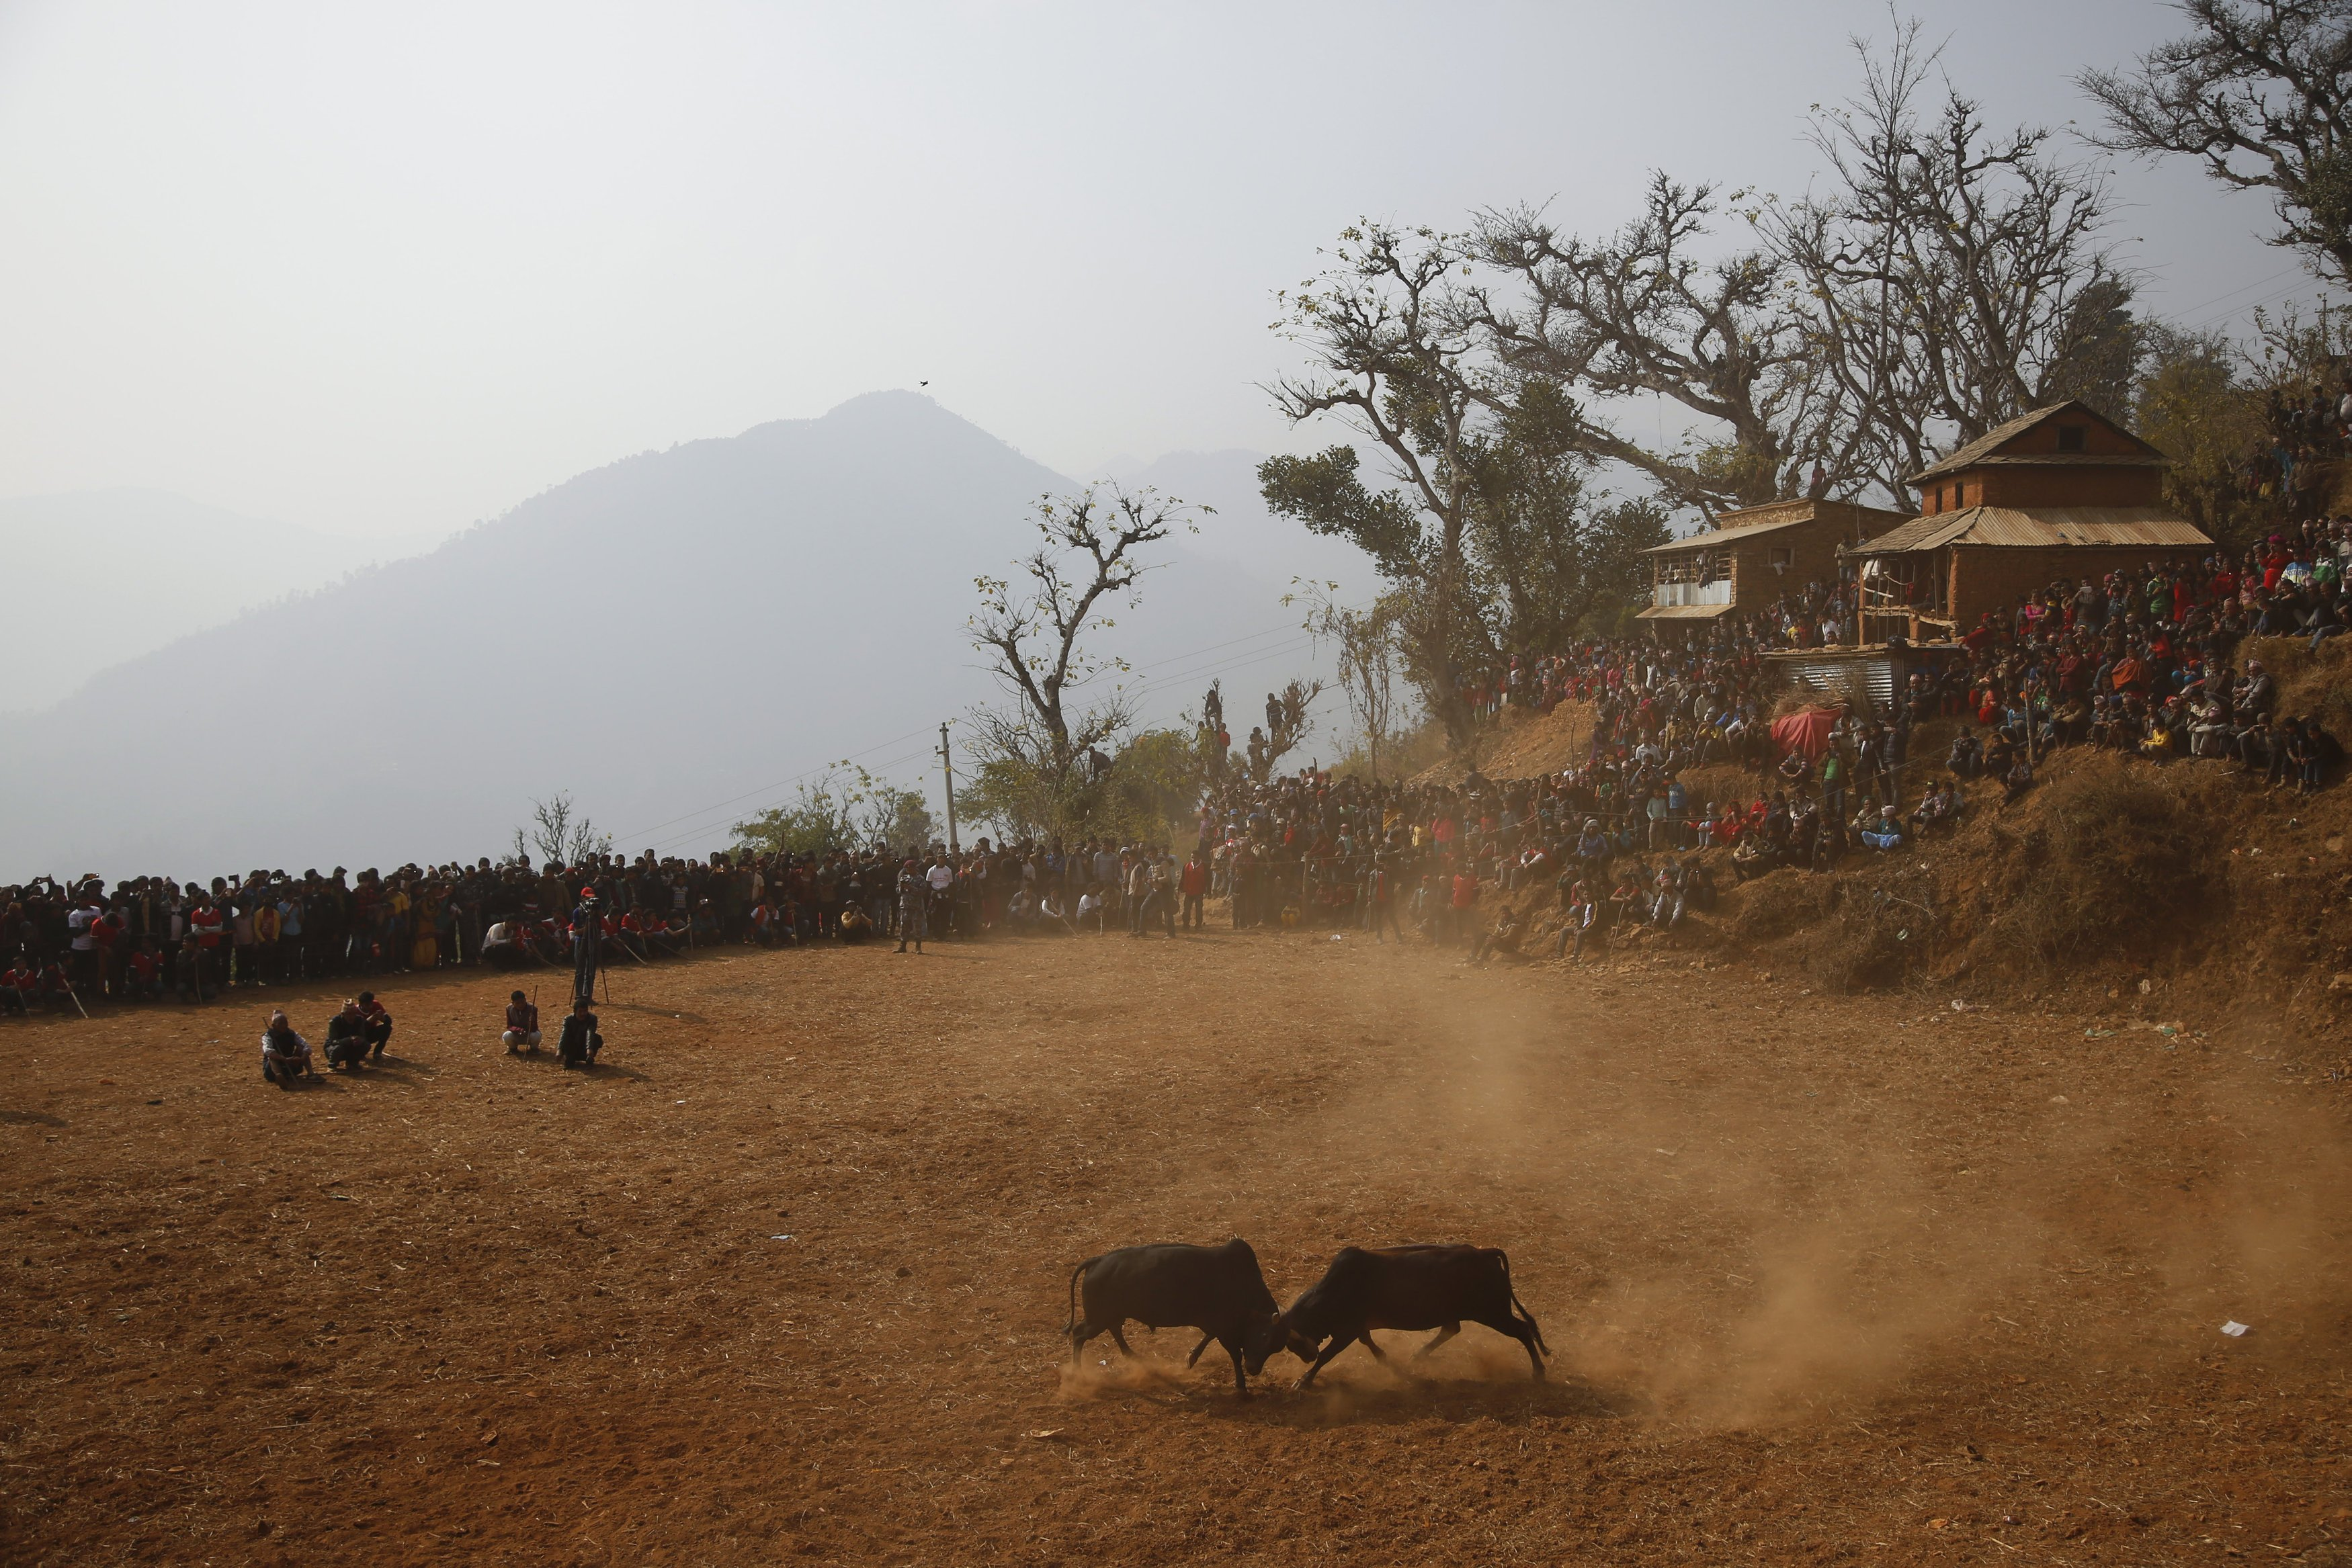 Villagers watch as bulls fight during the Maghesangranti festival at Talukachandani village in Nuwakot district near Kathmandu, Nepal, on Jan. 15, 2016.